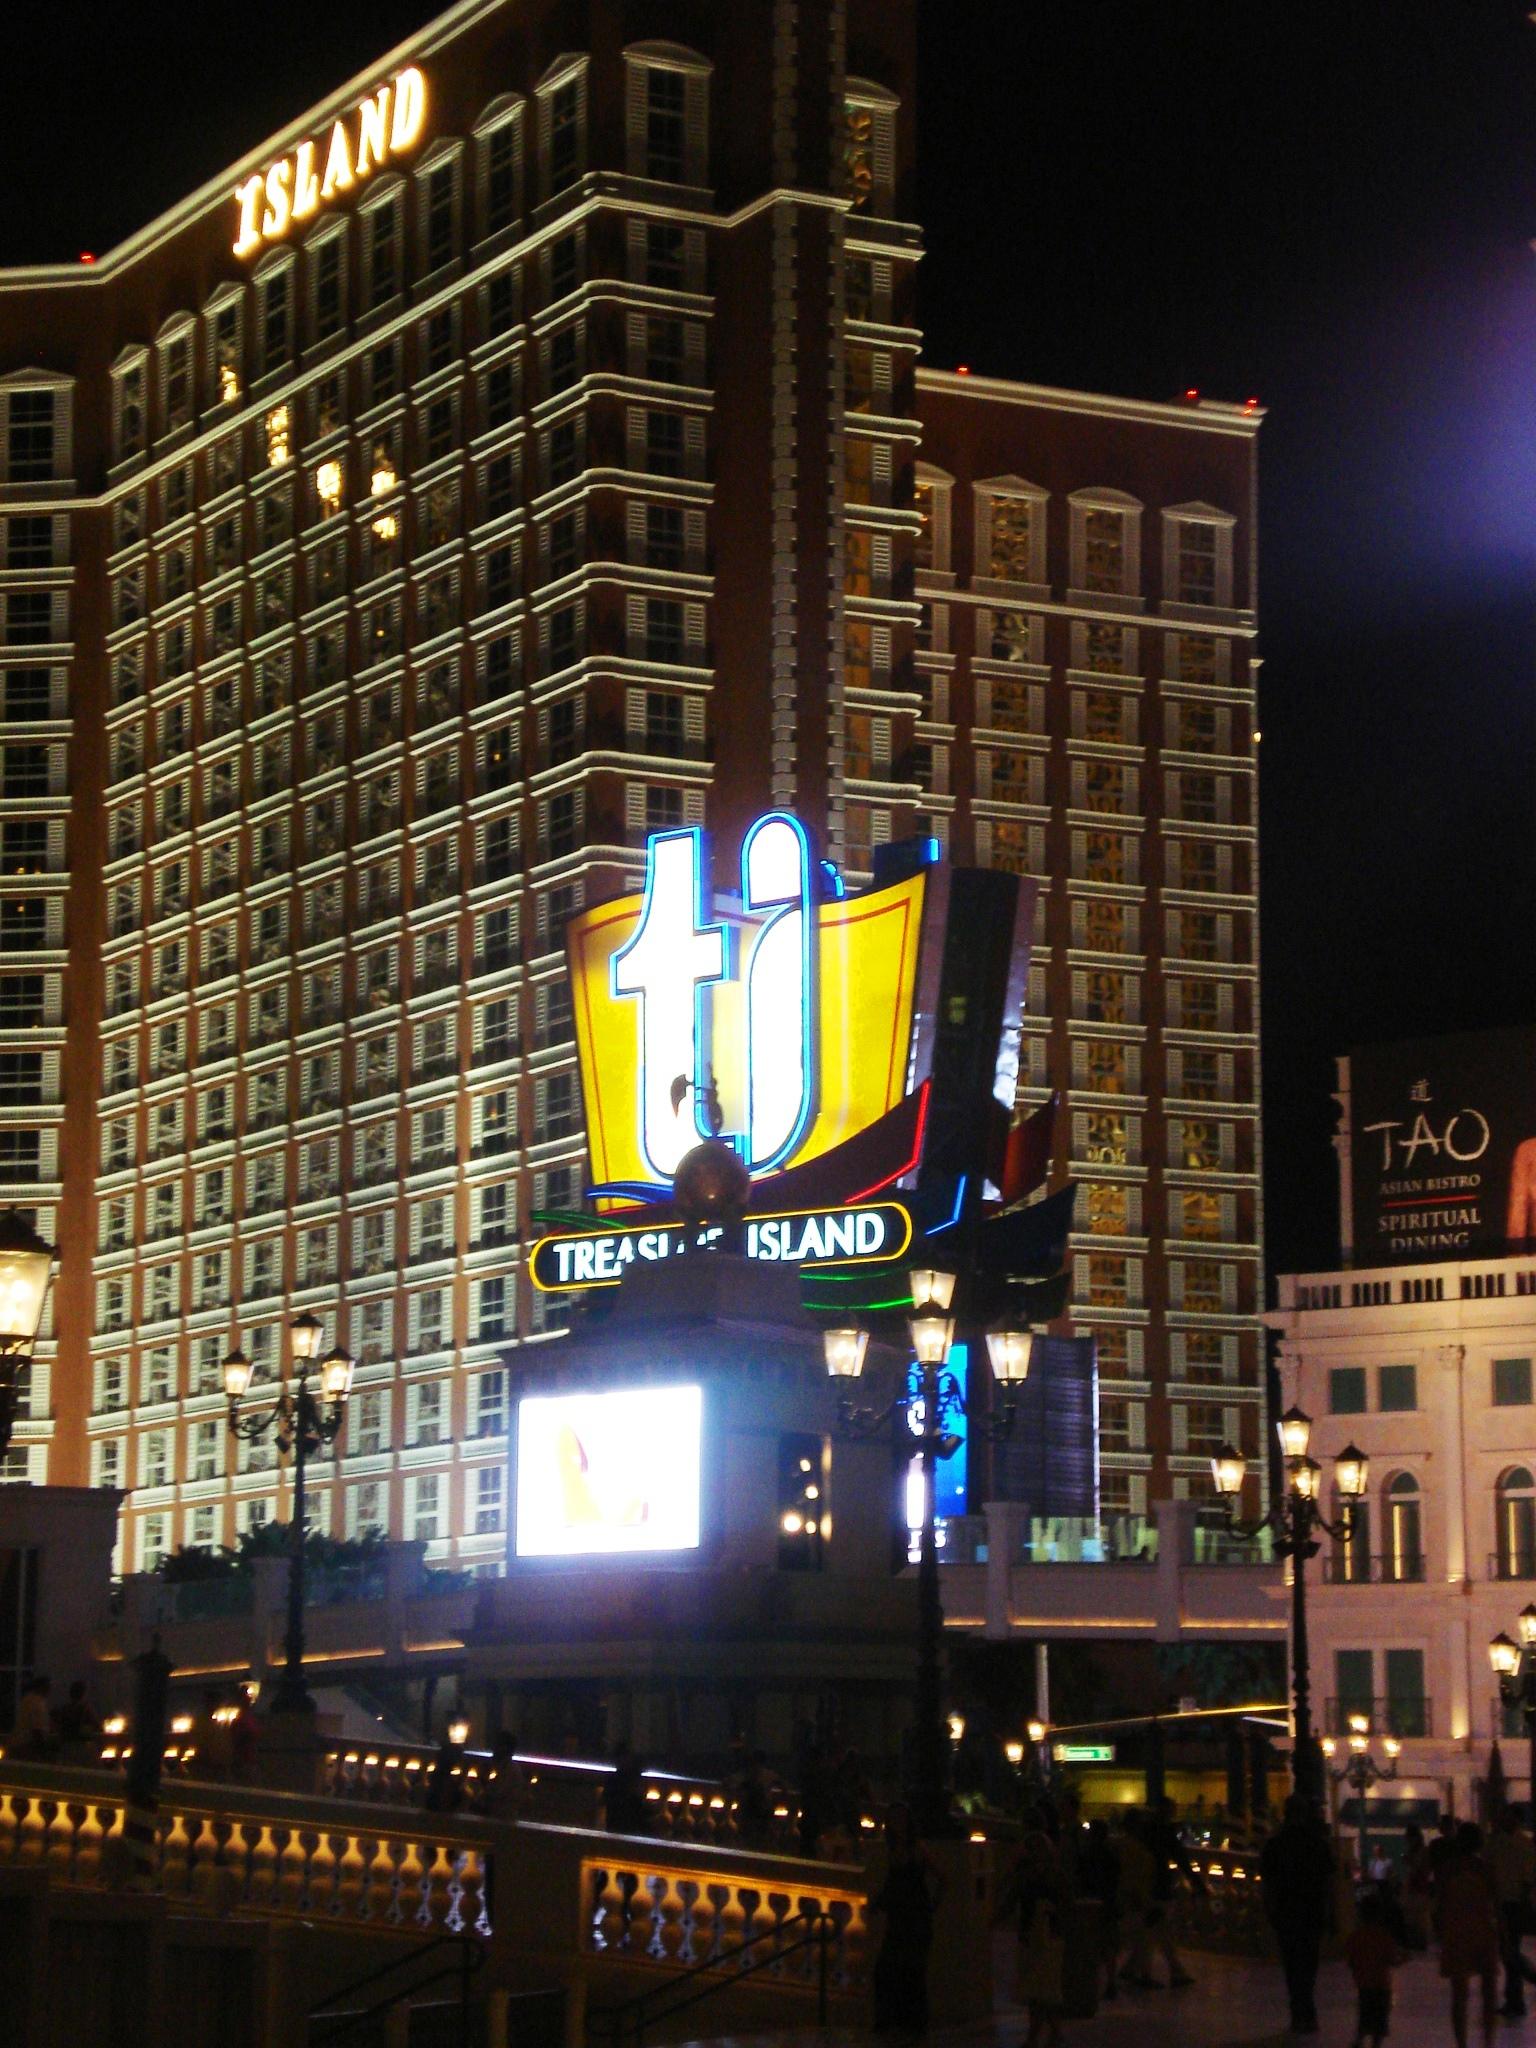 Treasure Island Las Vegas Nv